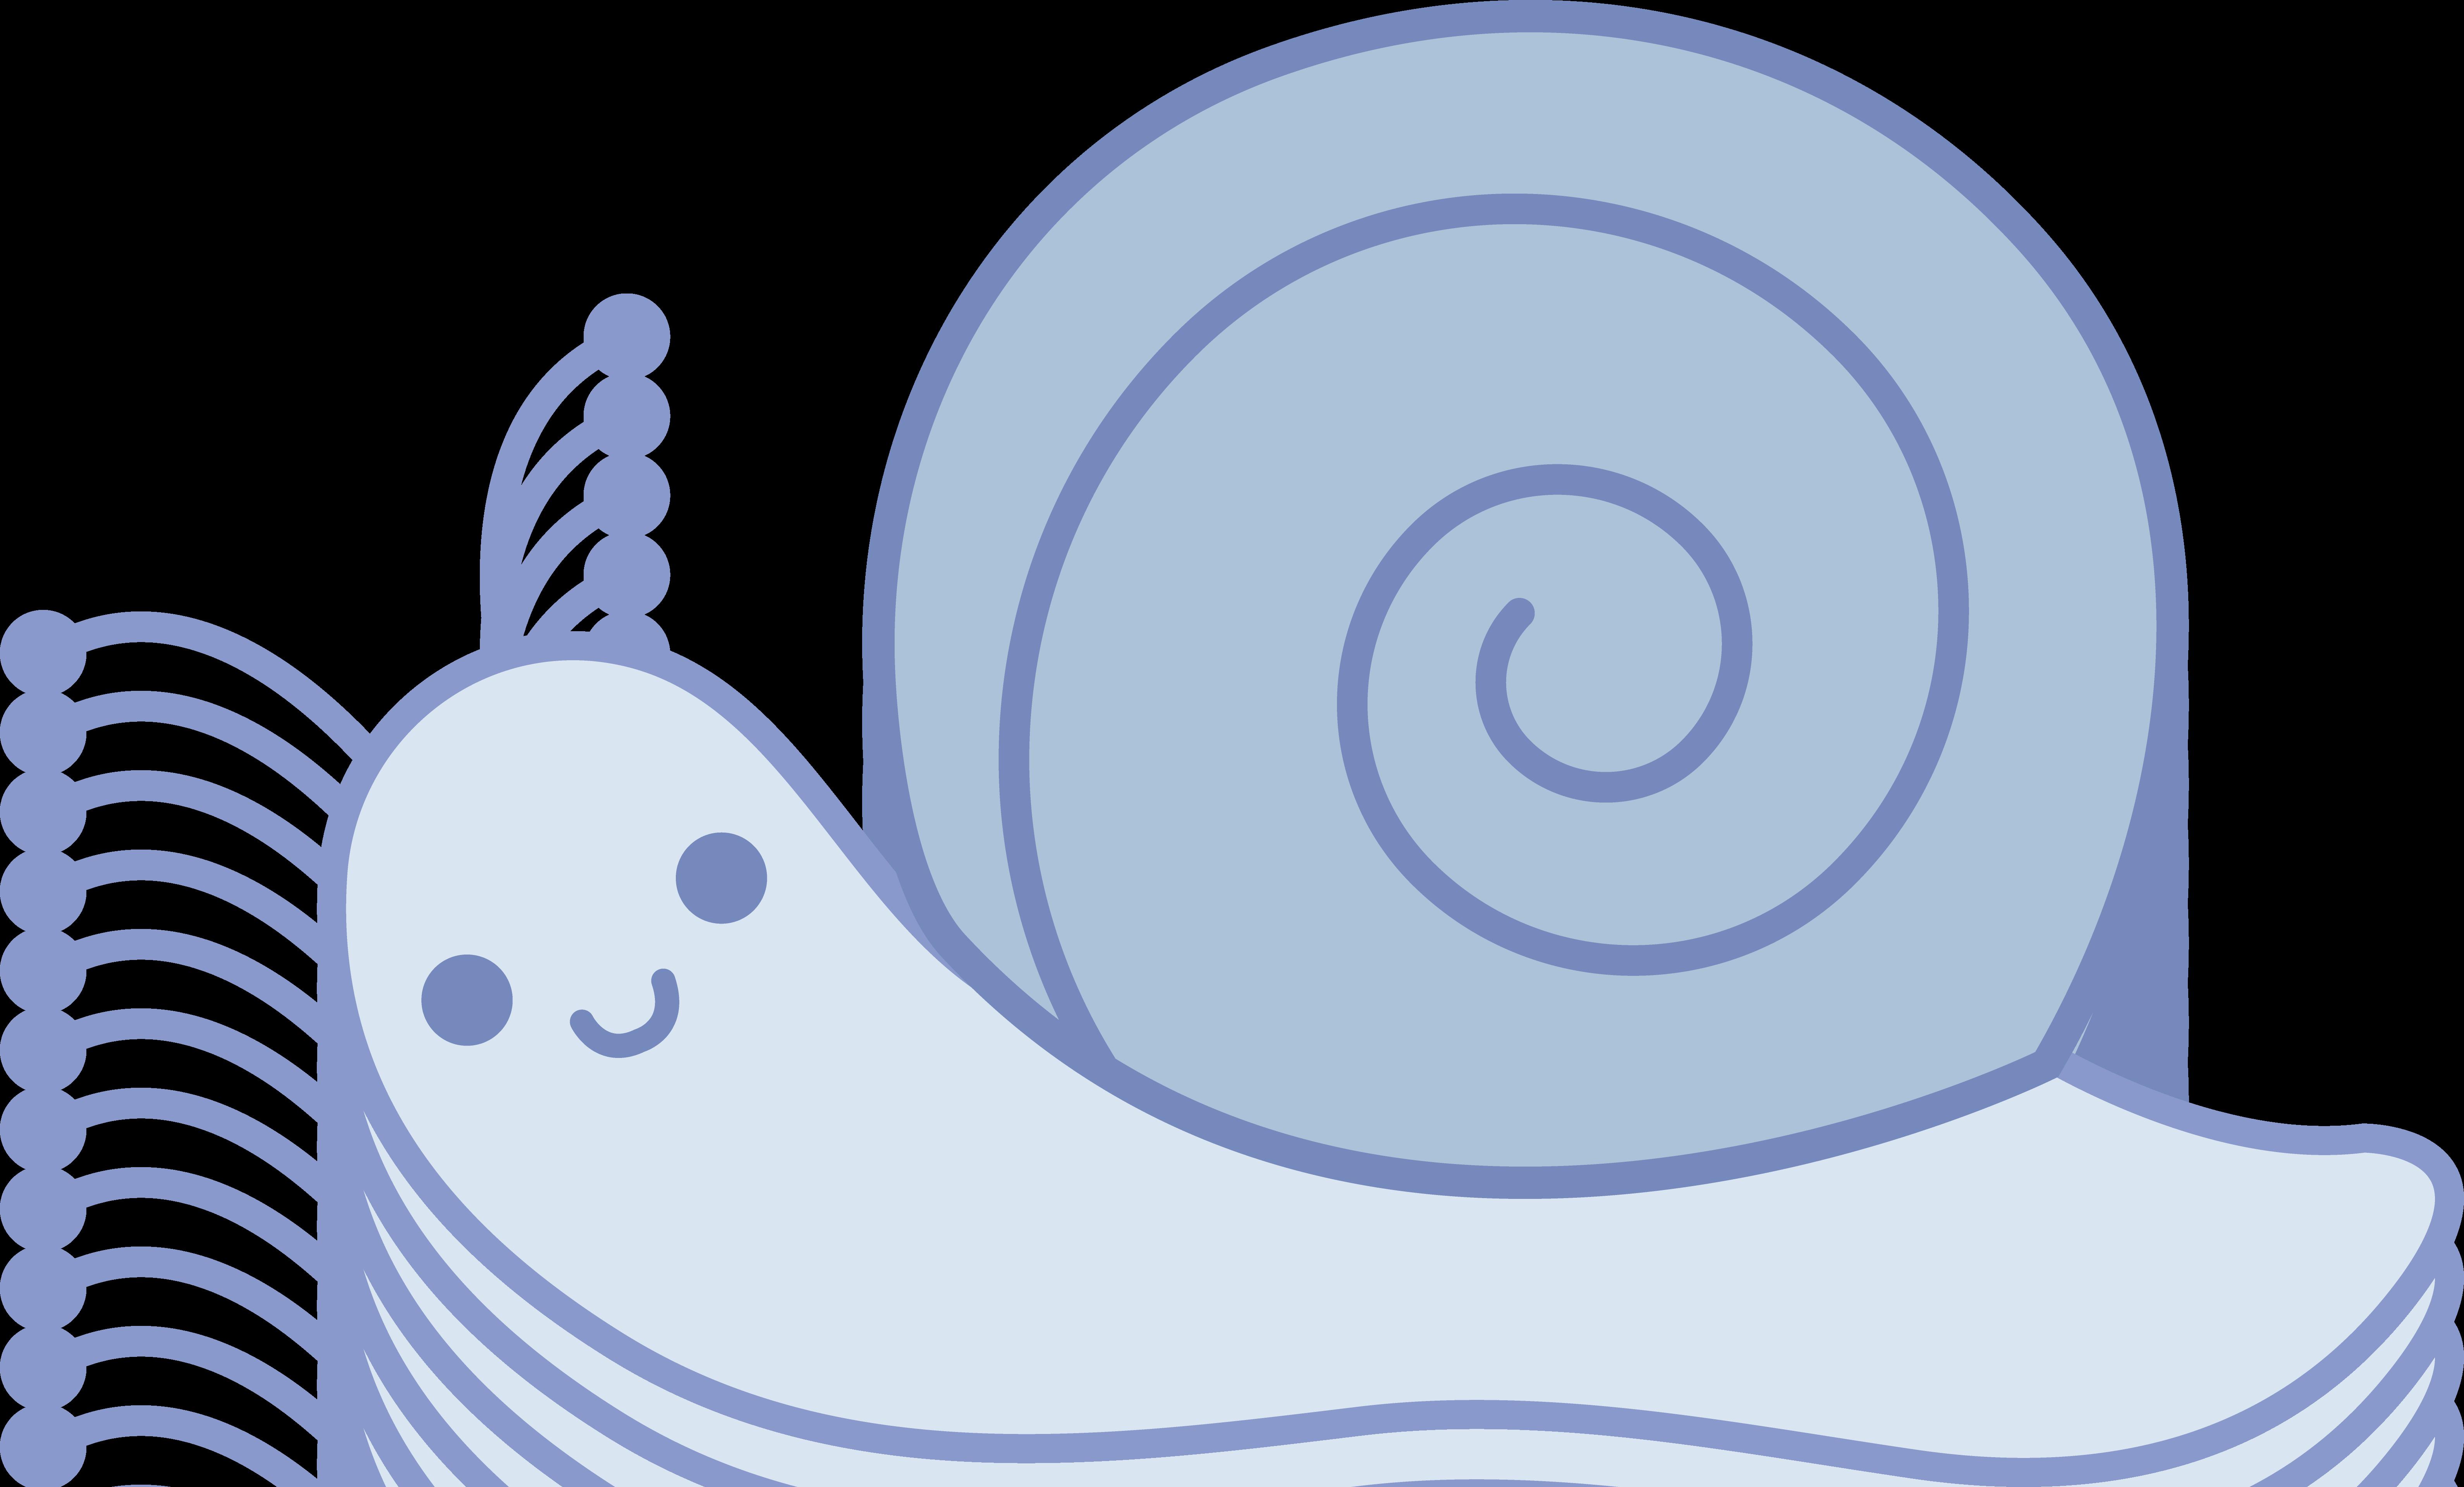 Mollusc clipart cute cartoon #1